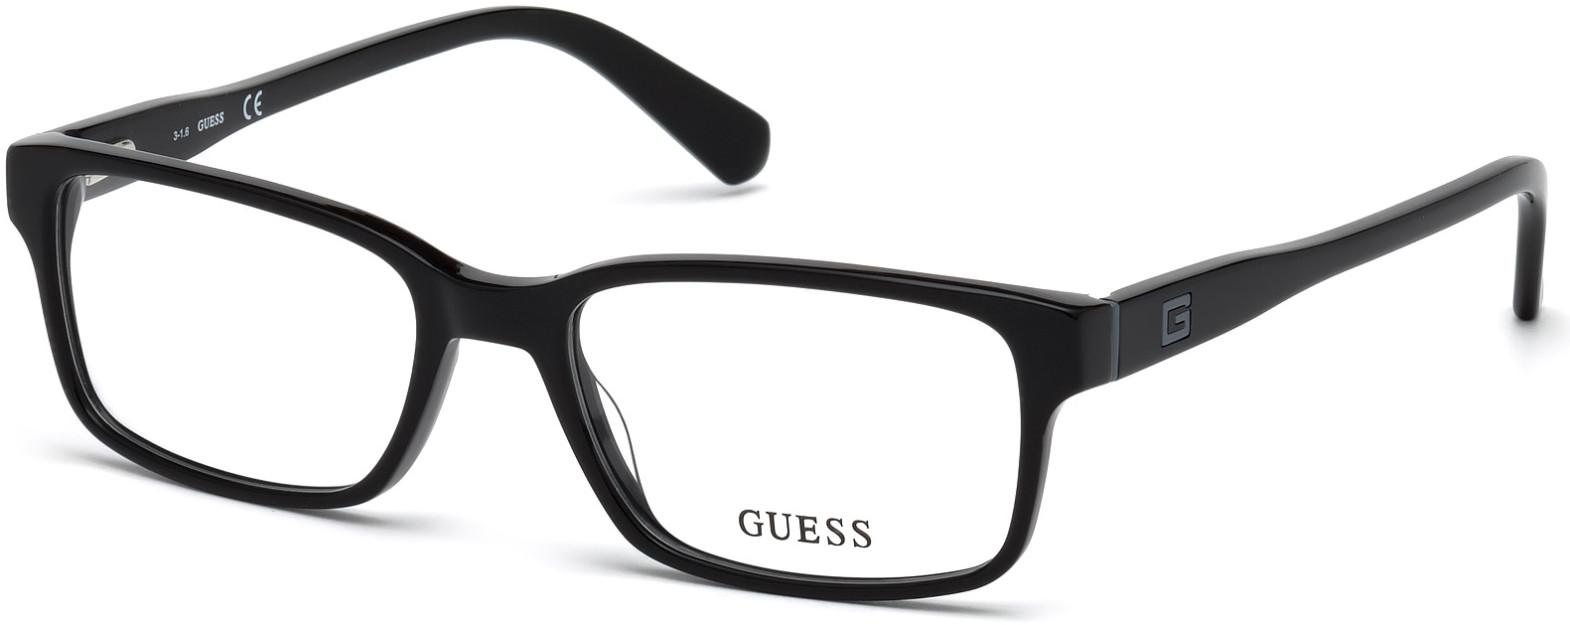 GUESS GU1906 style-color 001 Shiny Black